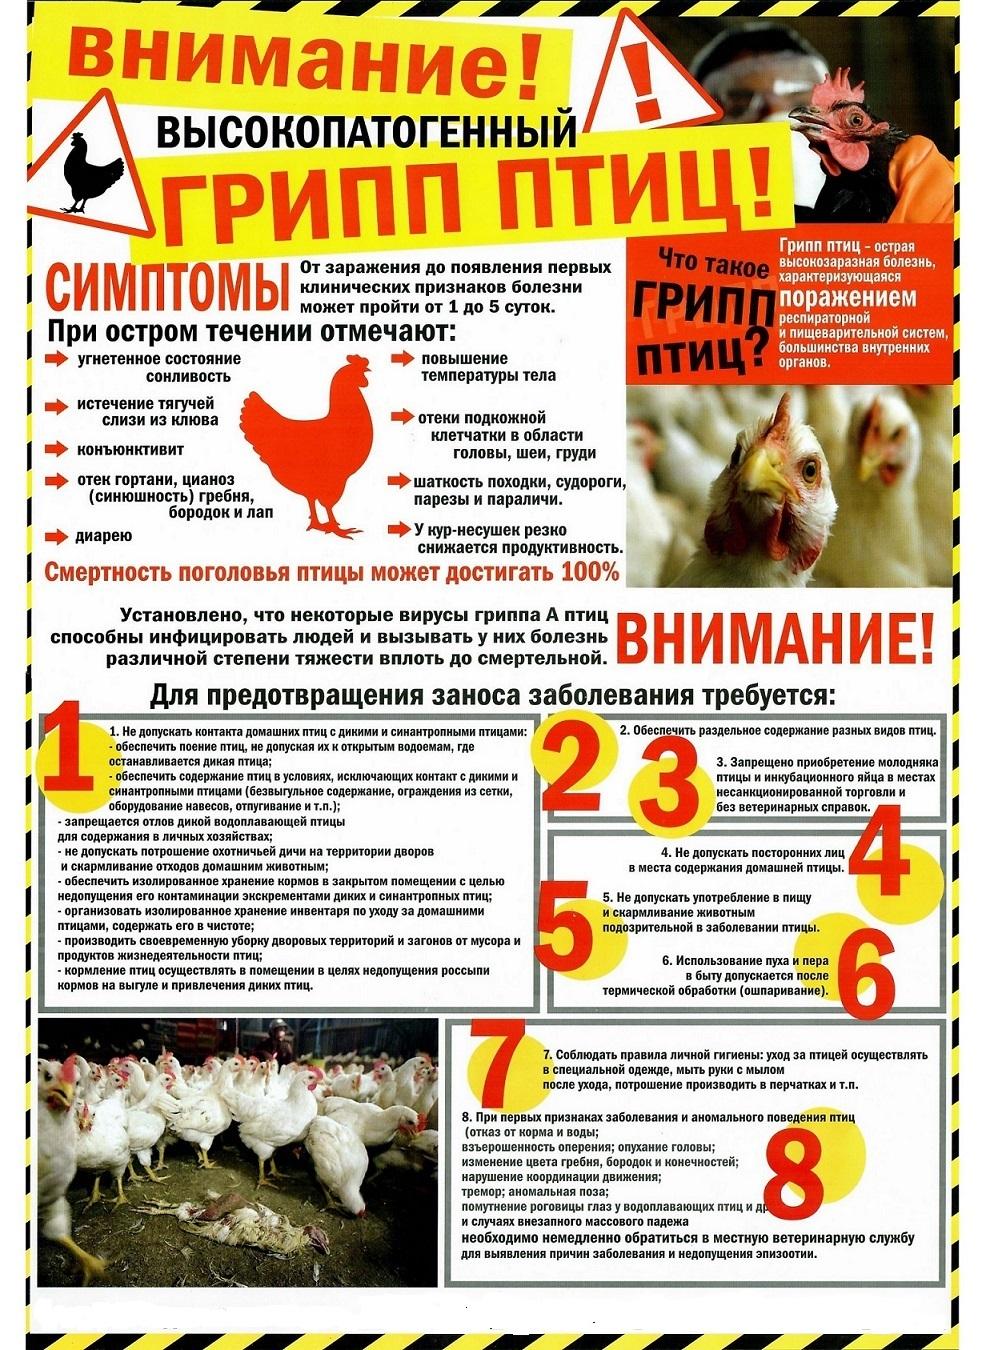 Об обострении ситуации по гриппу птиц